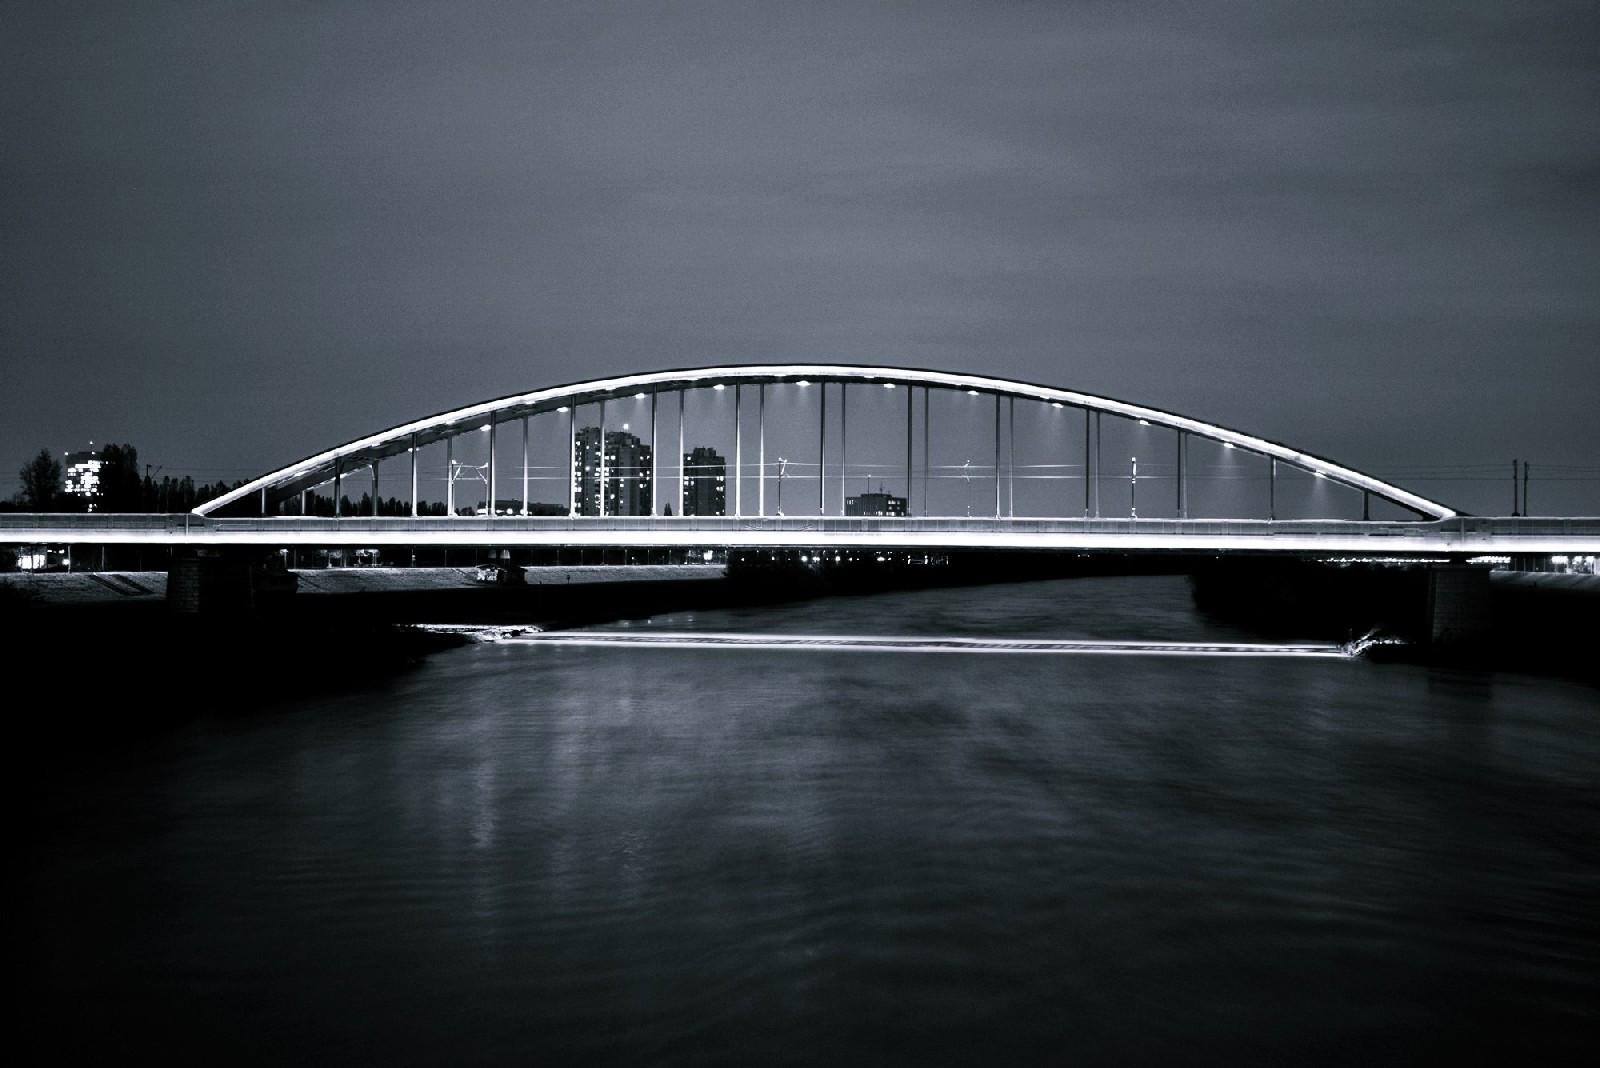 Dominik_Papic_Henrixov most_1